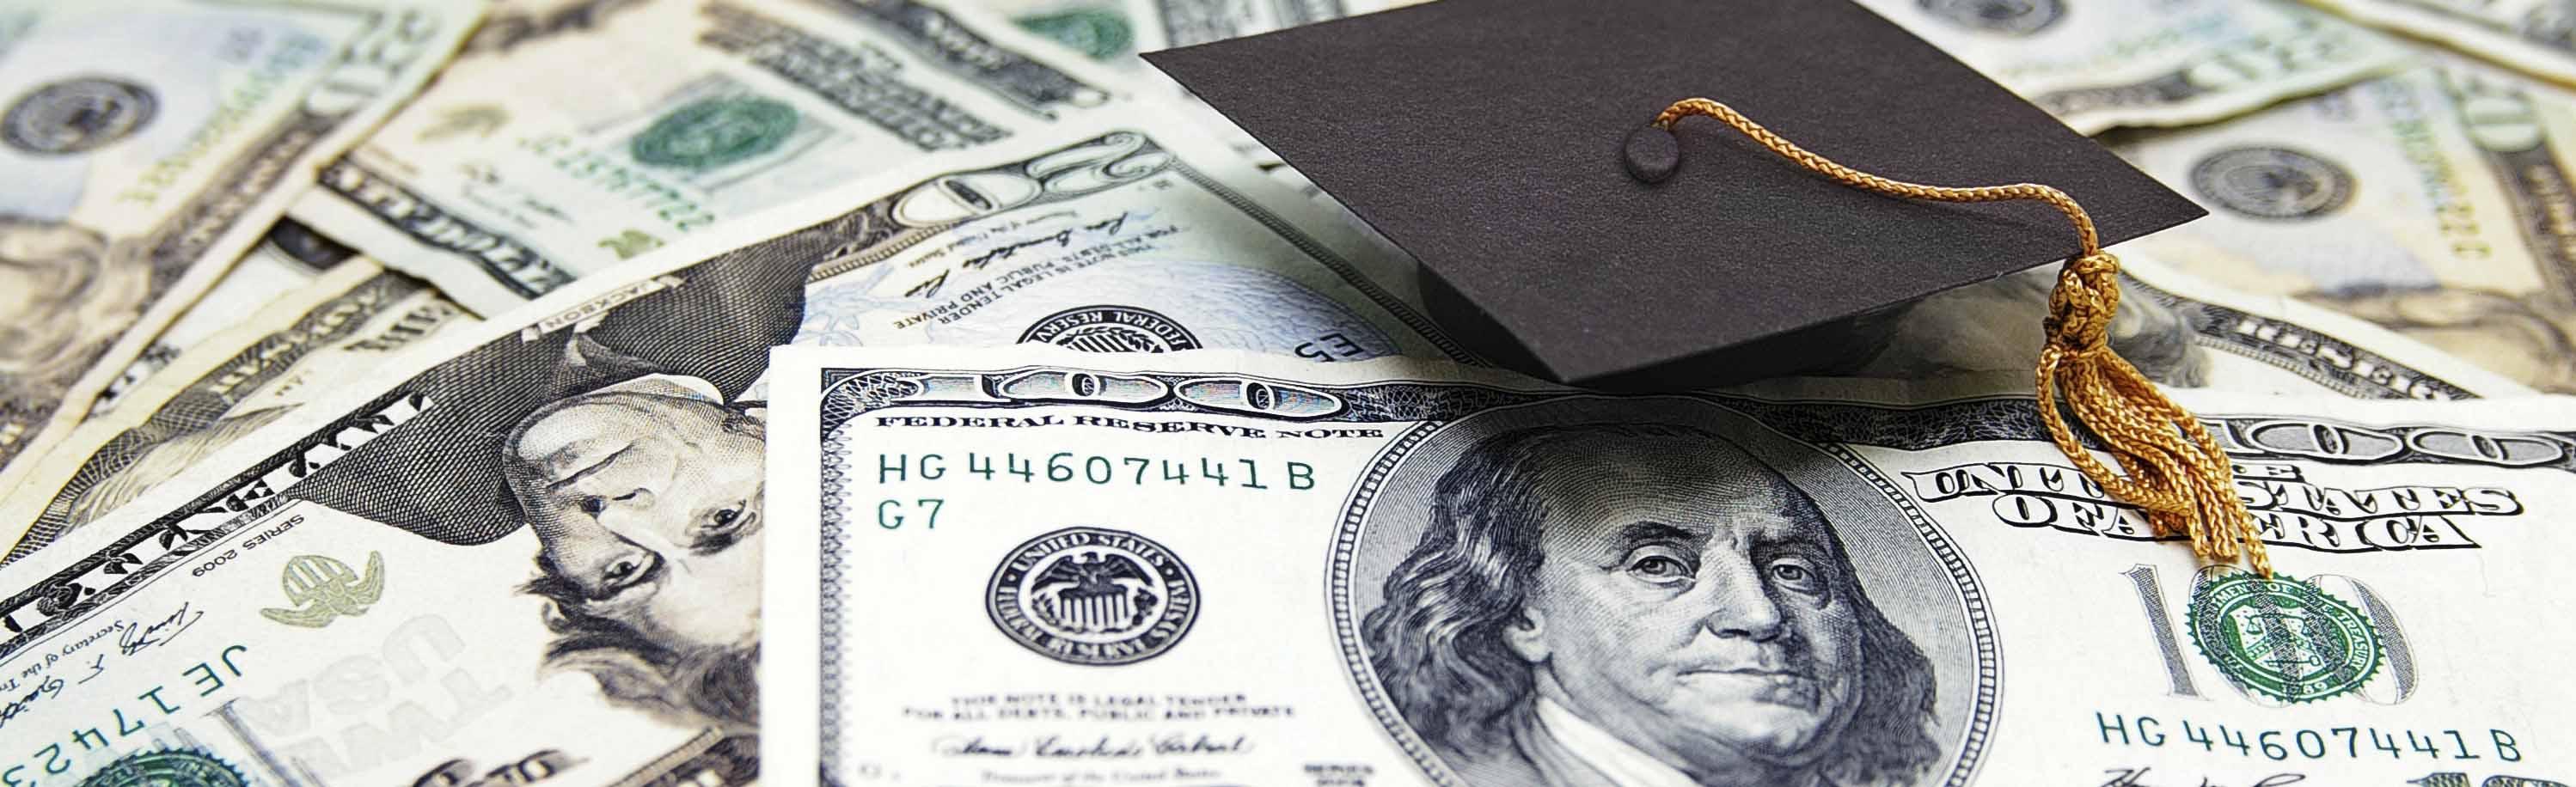 Apply For Varied Scholarship Programs Online Now